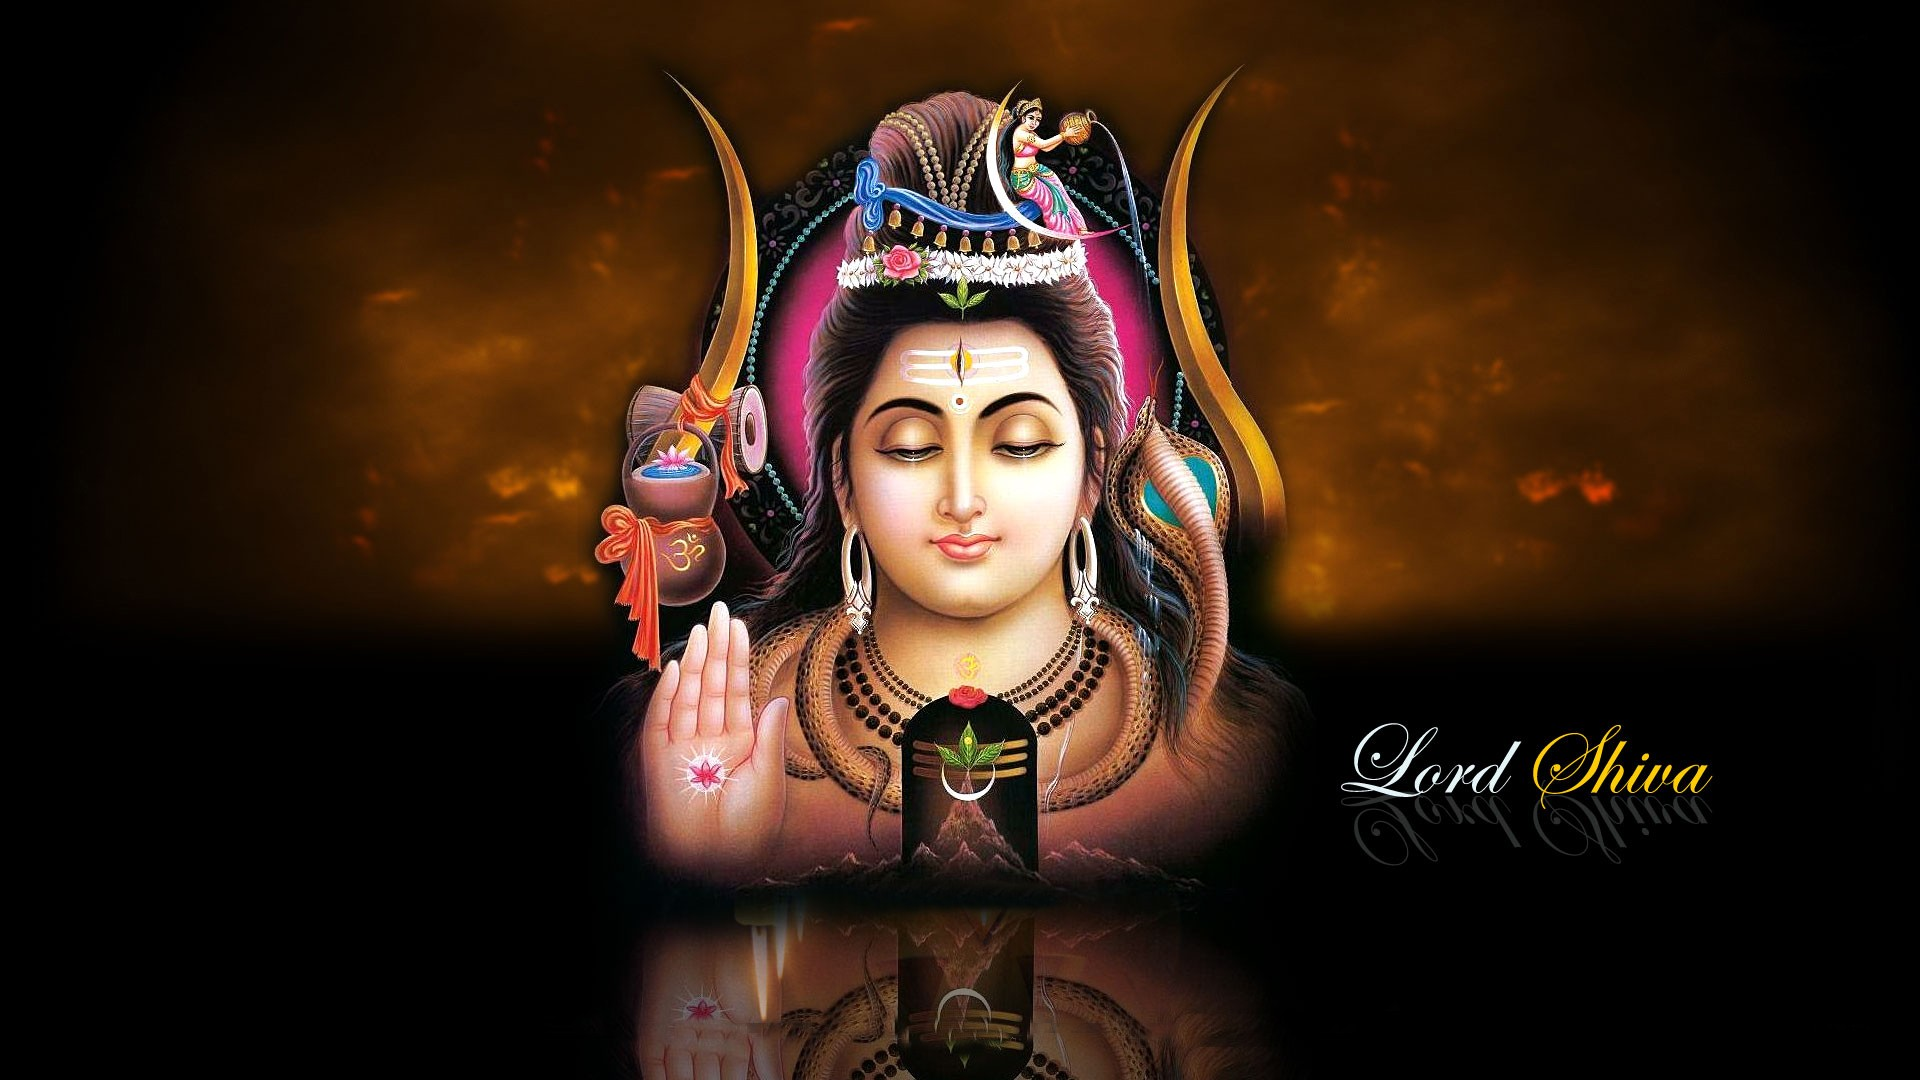 Lord Shiva HD Background Wallpaper